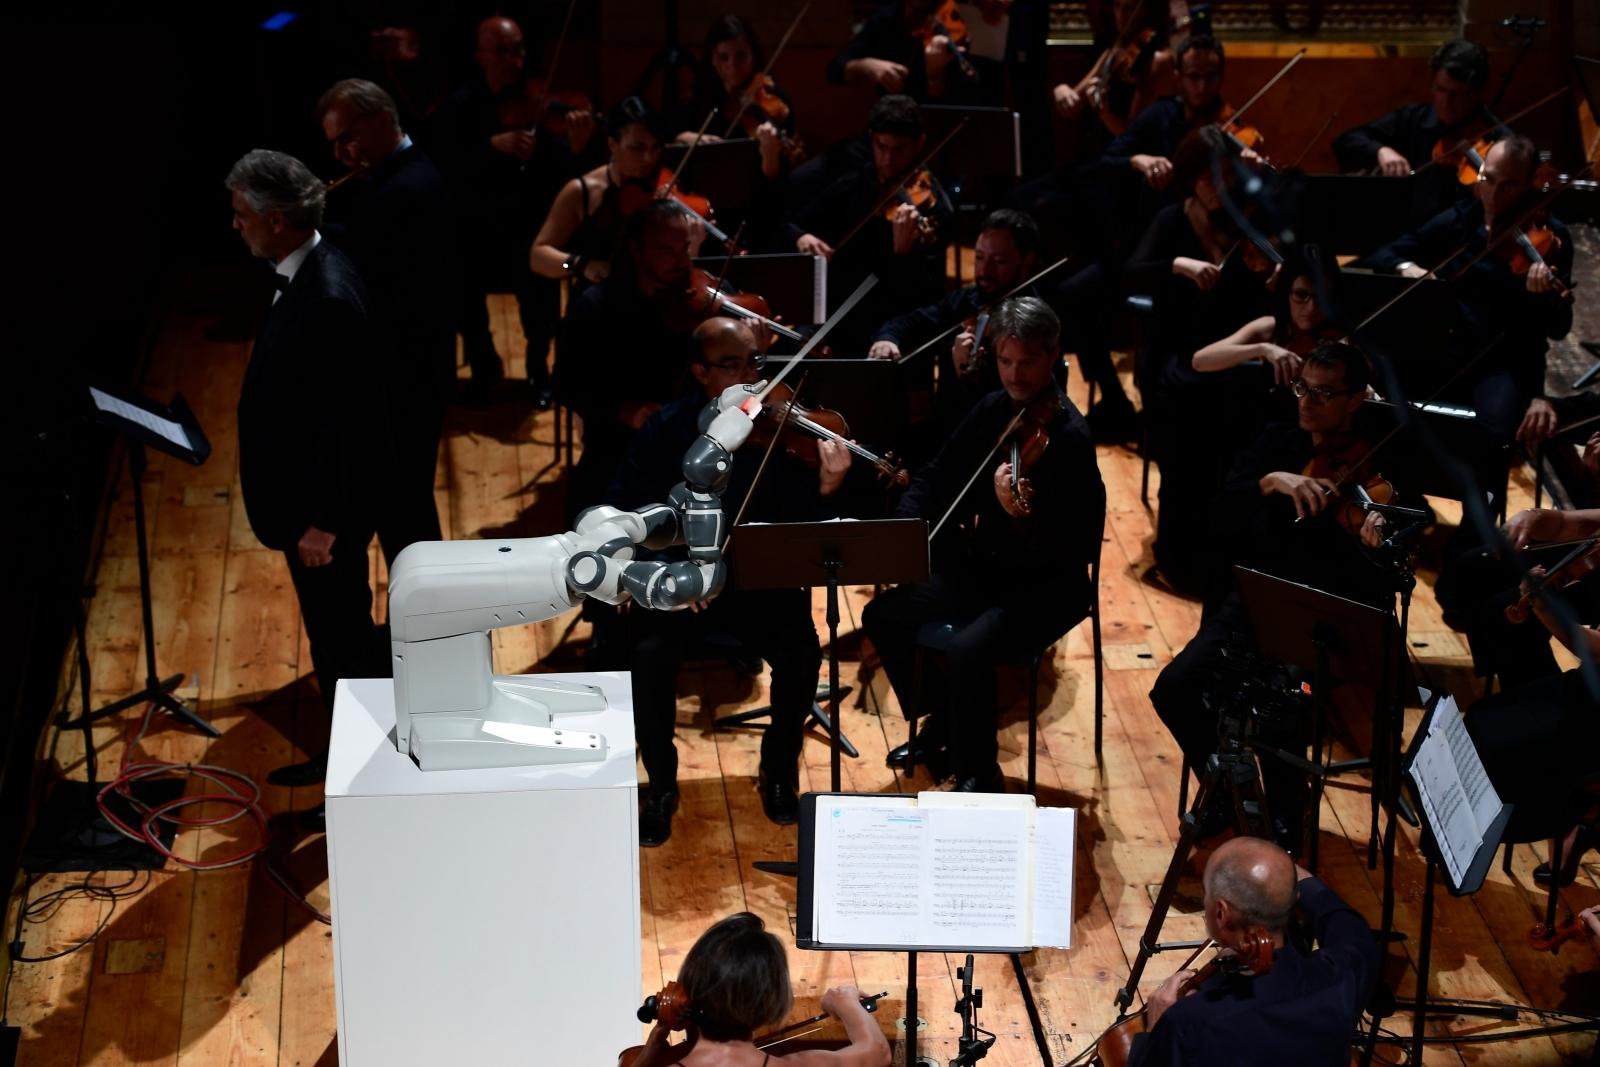 Robot orchestra conductor YuMi